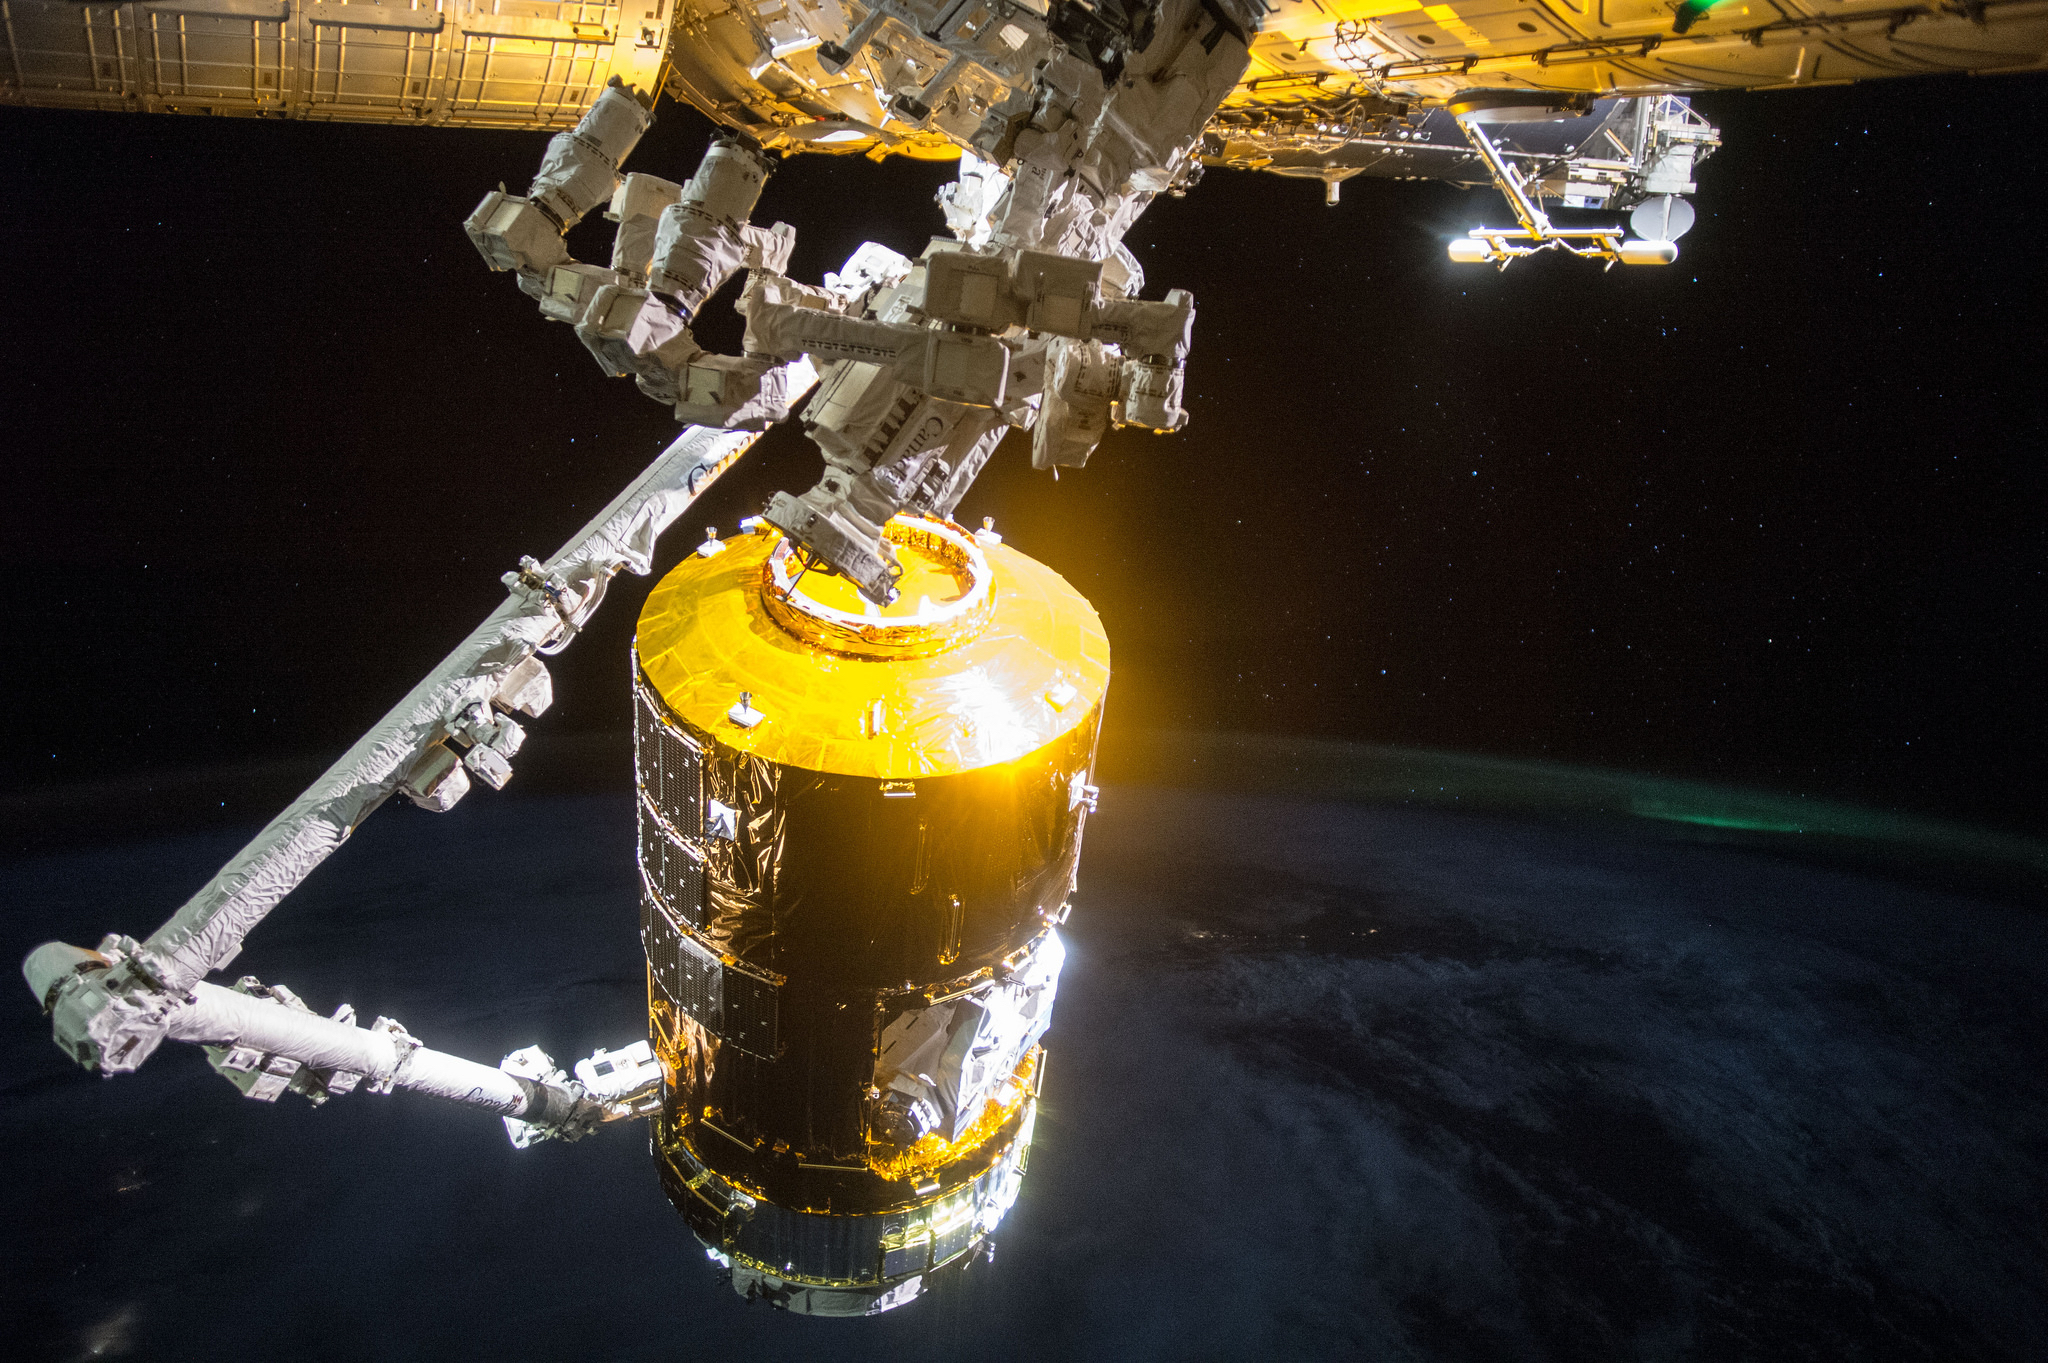 JAXA HTV-5 Grappled by Canadarm2